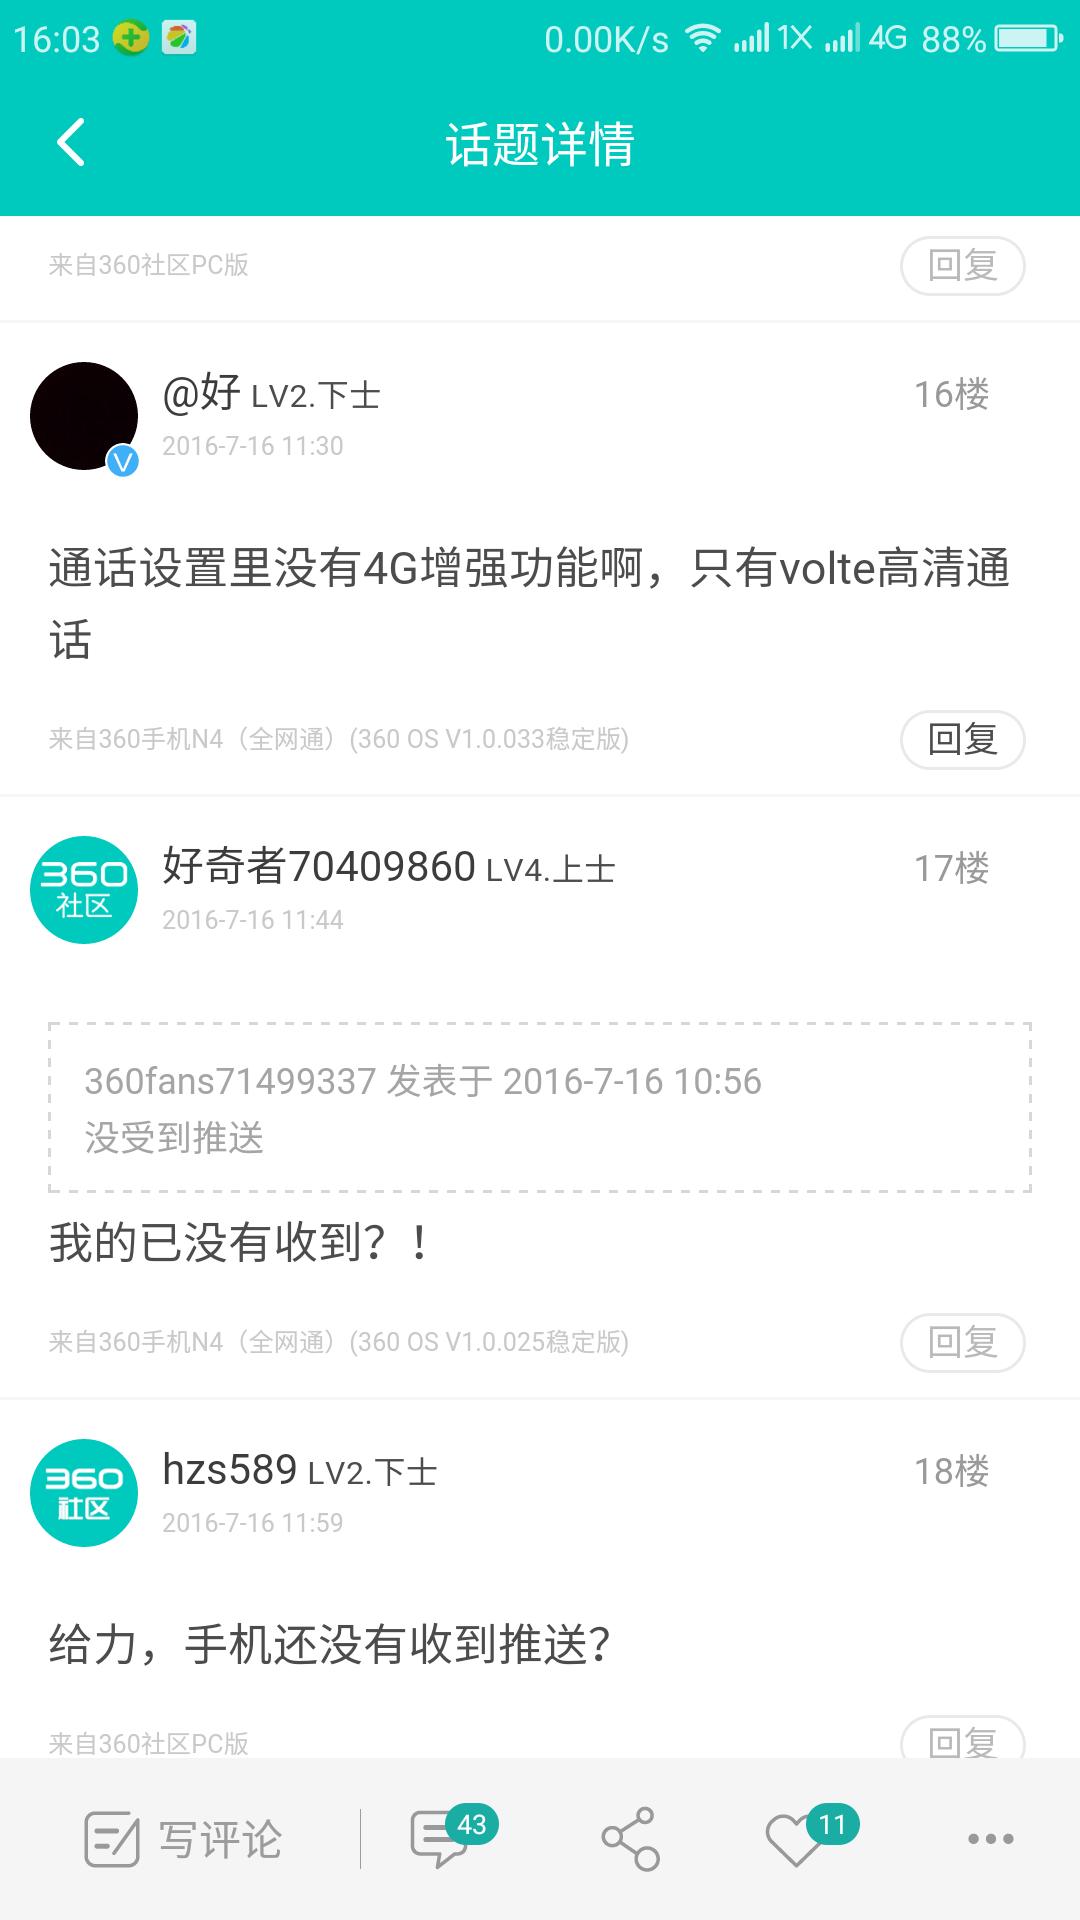 Screenshot_2016-07-16-16-03-34.png